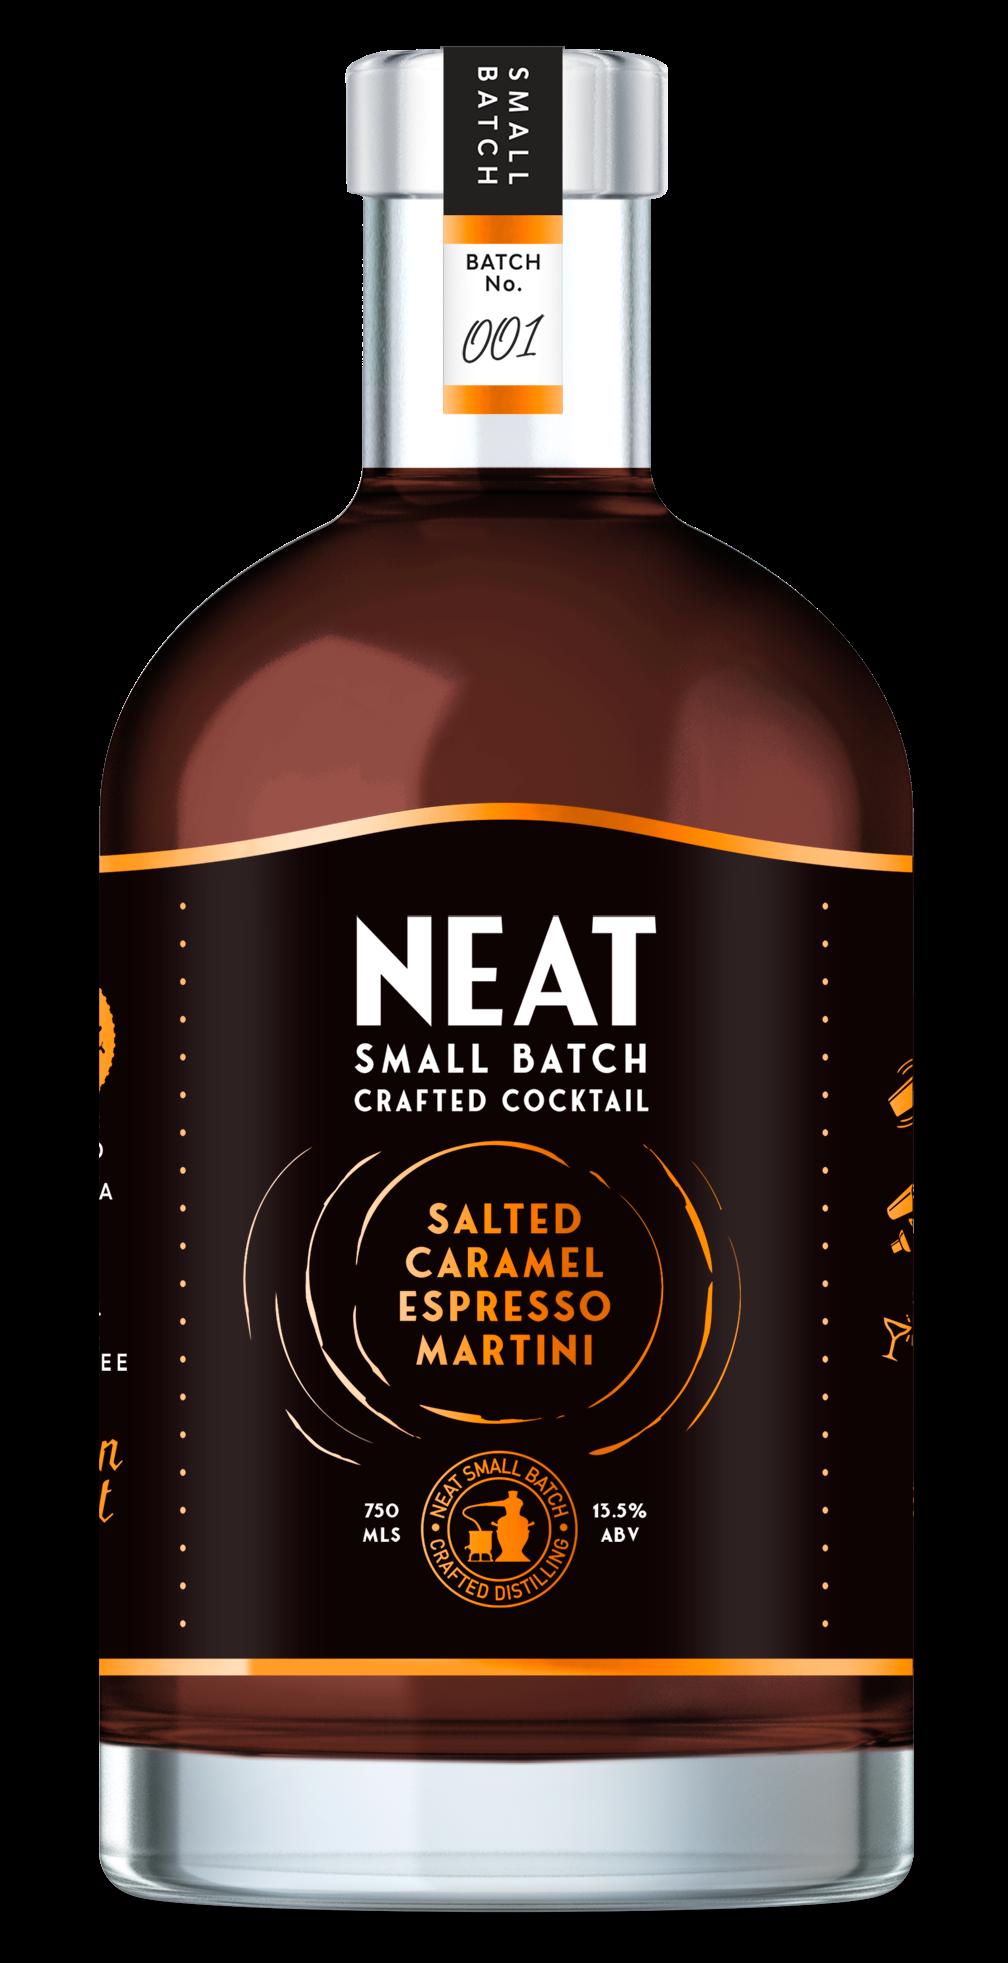 Neat Salted Caramel Espresso Martini Bottle